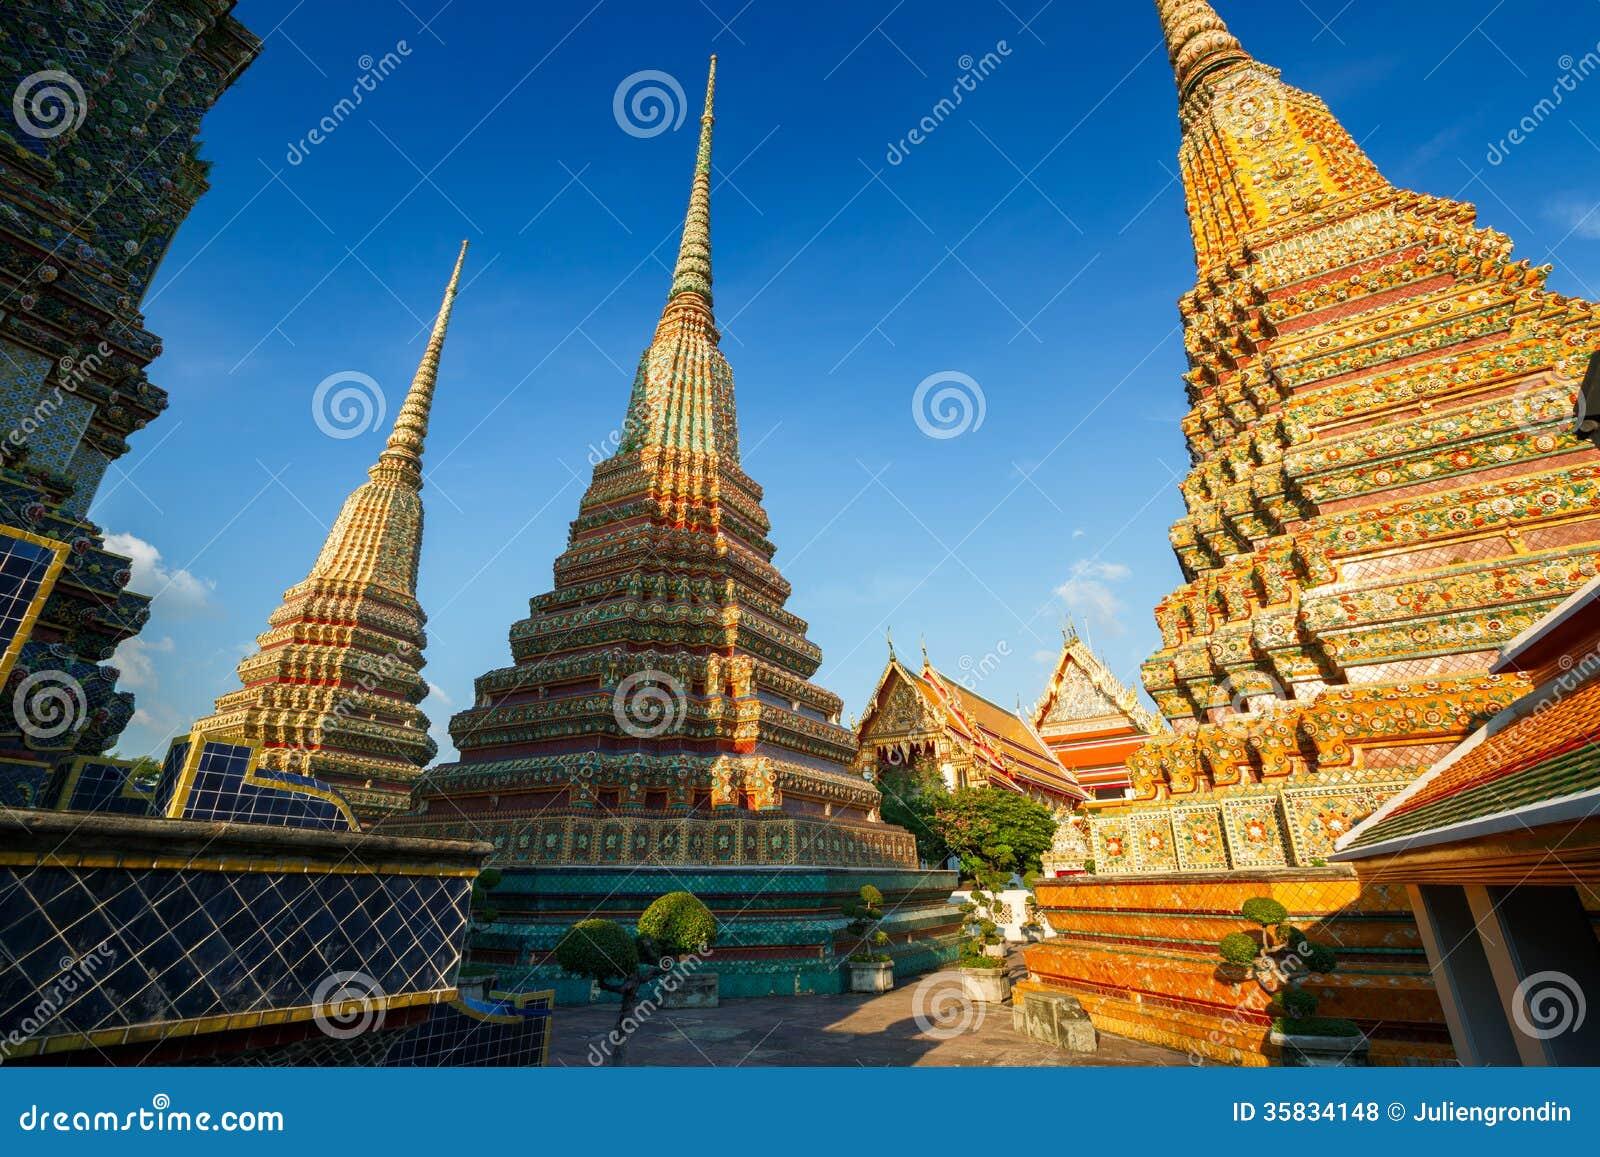 Wat Pho στη Μπανγκόκ, Ταϊλάνδη